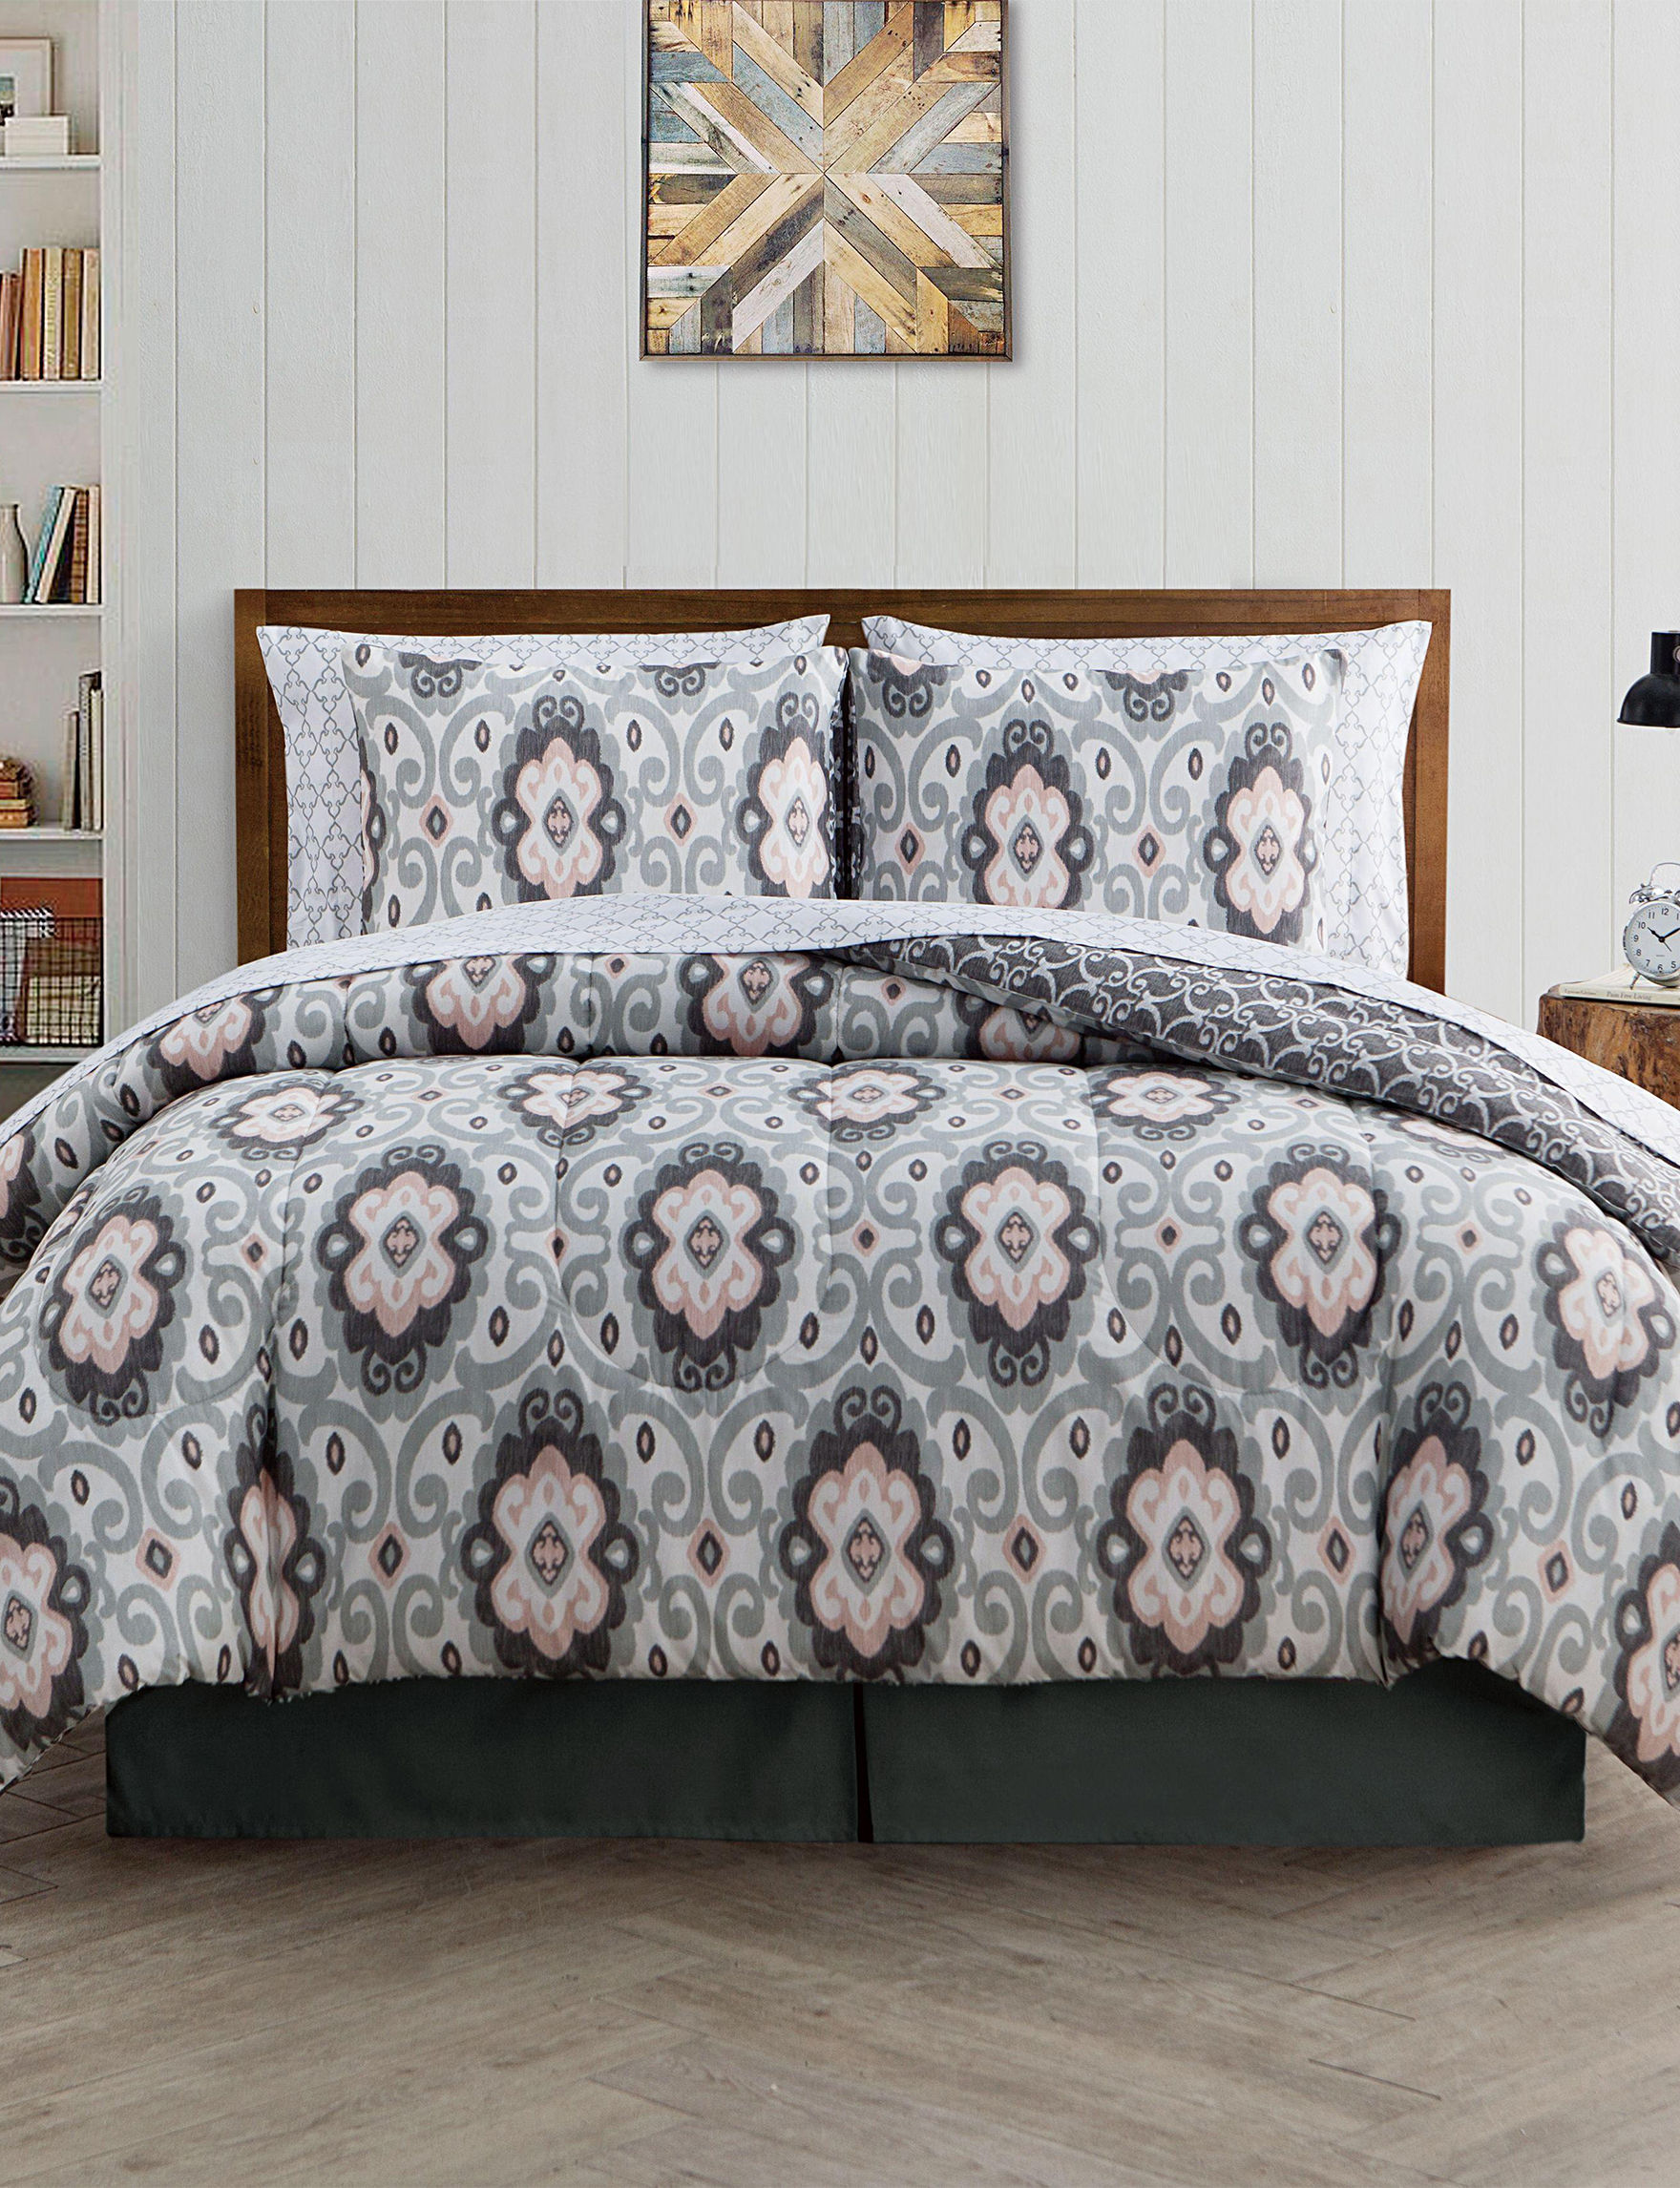 Avondale Manor Grey Comforters & Comforter Sets Sheets